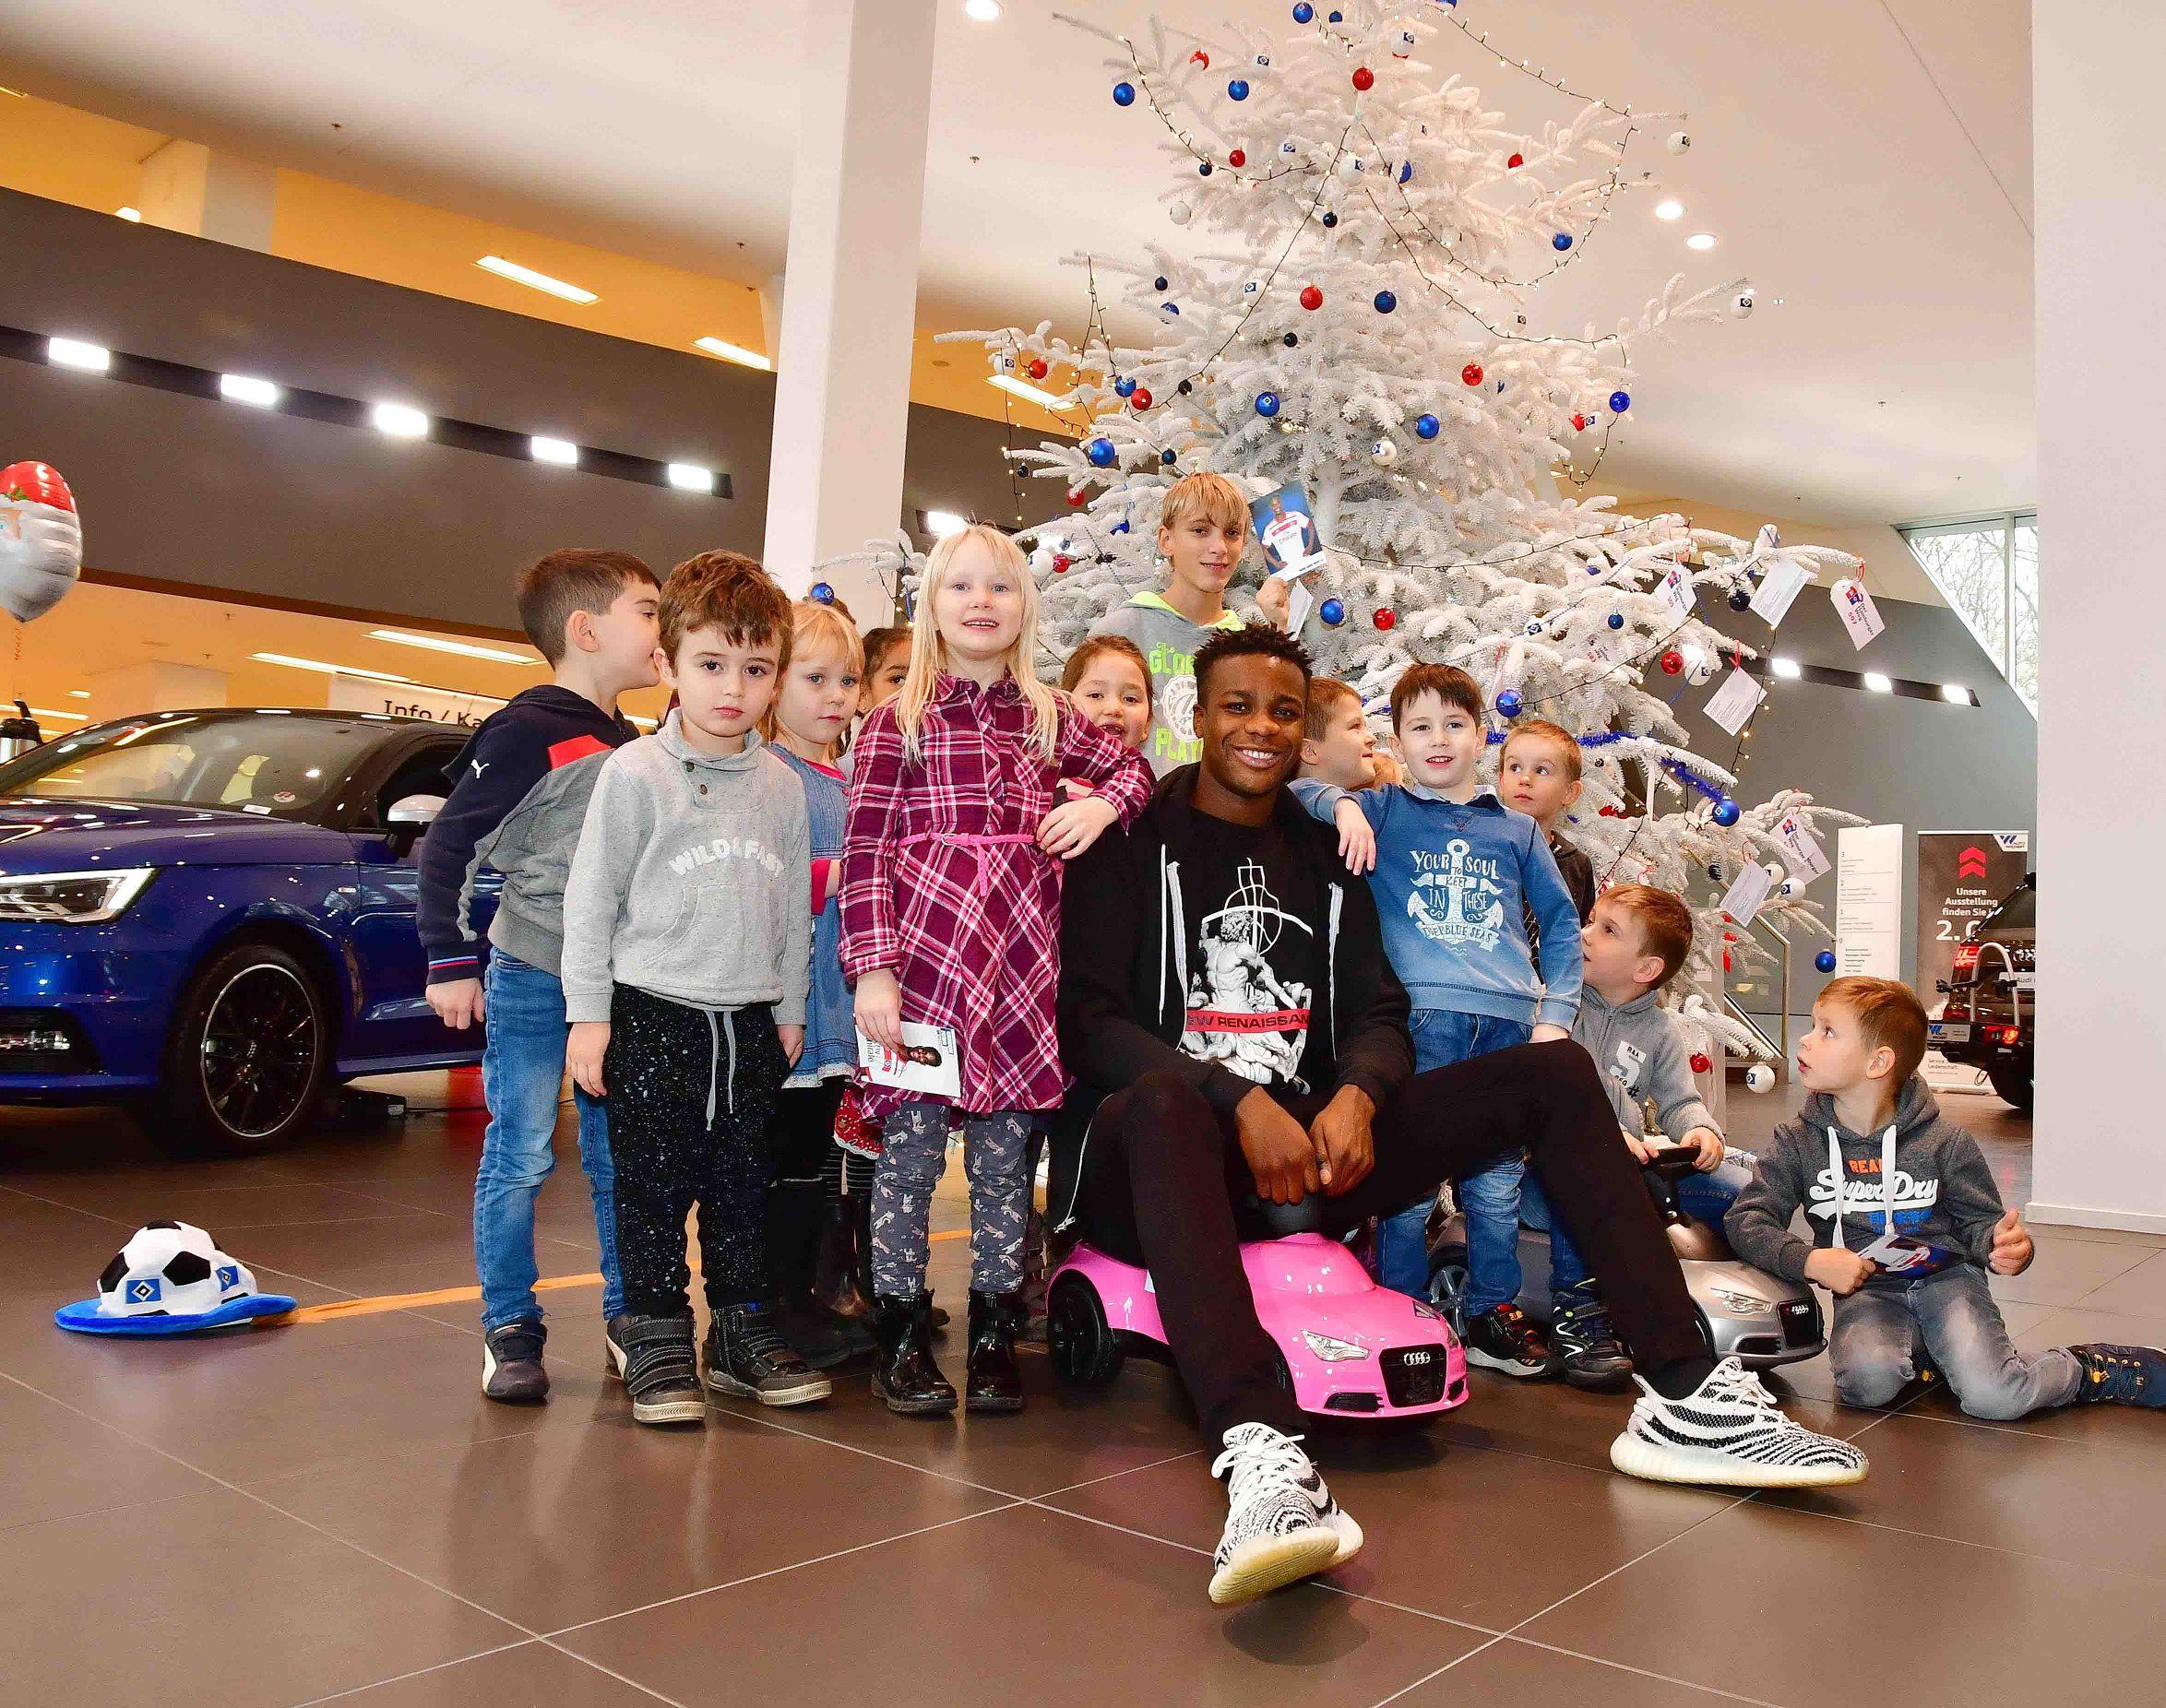 AW Hamburger Weg Audi 2017gh_Volle Fahrt voraus - Hamburger Weg 2017_HSV Profi Gideon Jung mit Kids Kita Elbkinder bei Auto Wichert